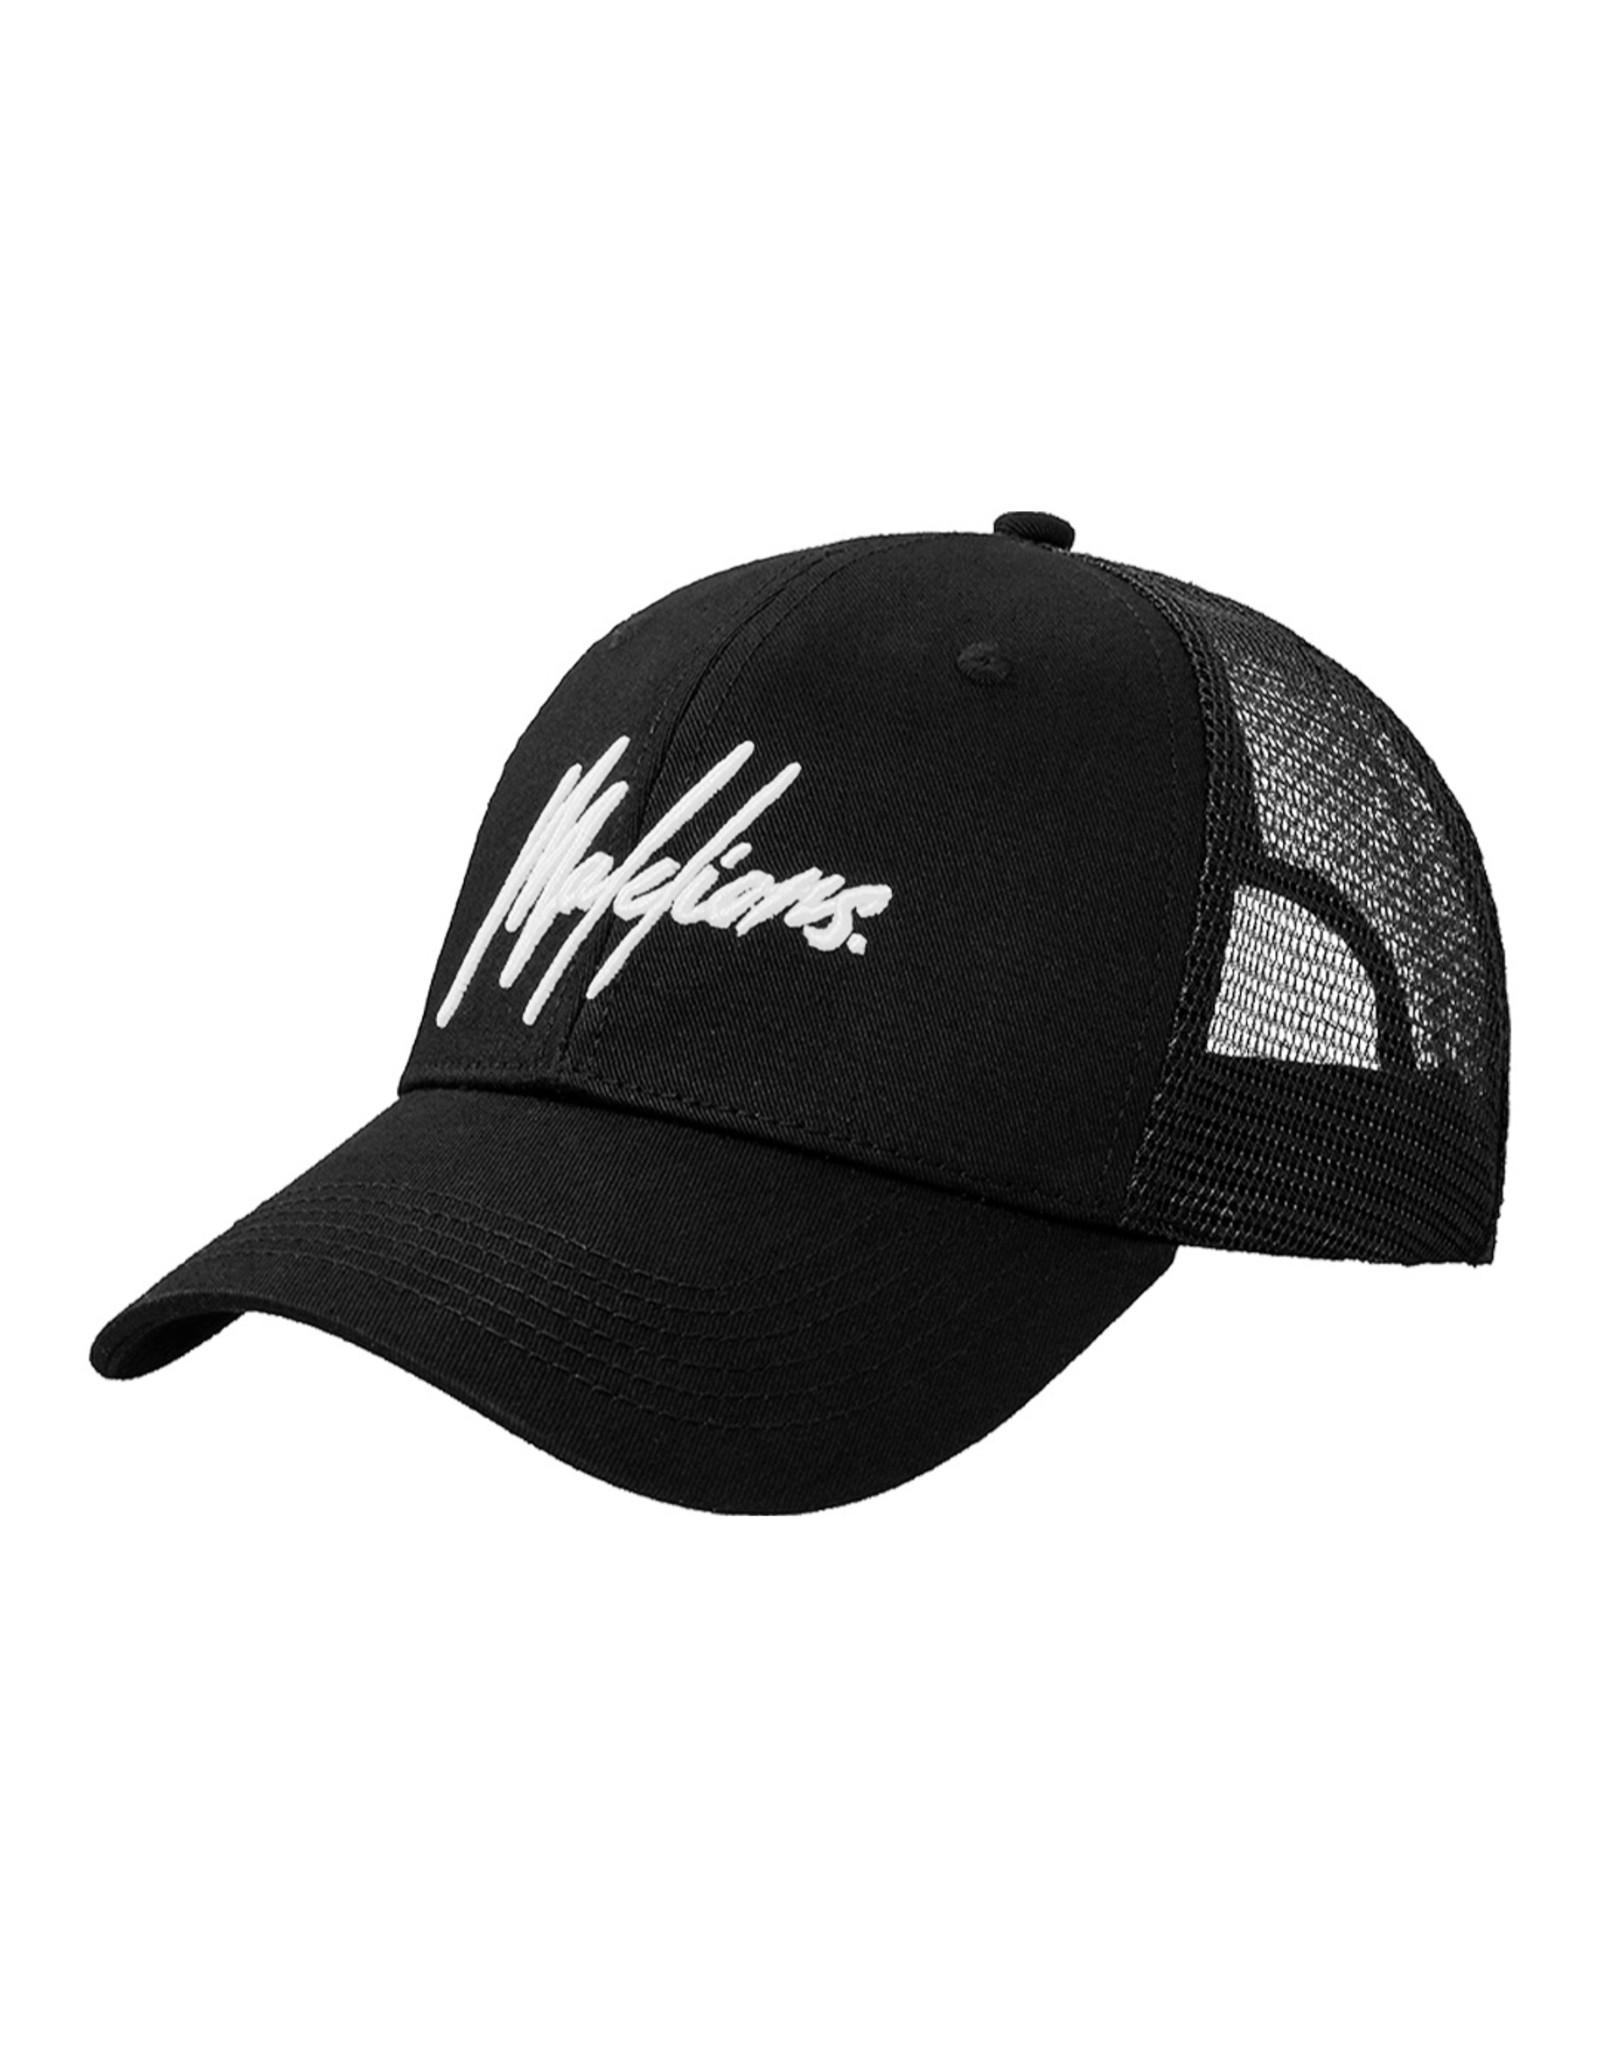 Malelions Malelions Junior Sport Signature Cap Black-White